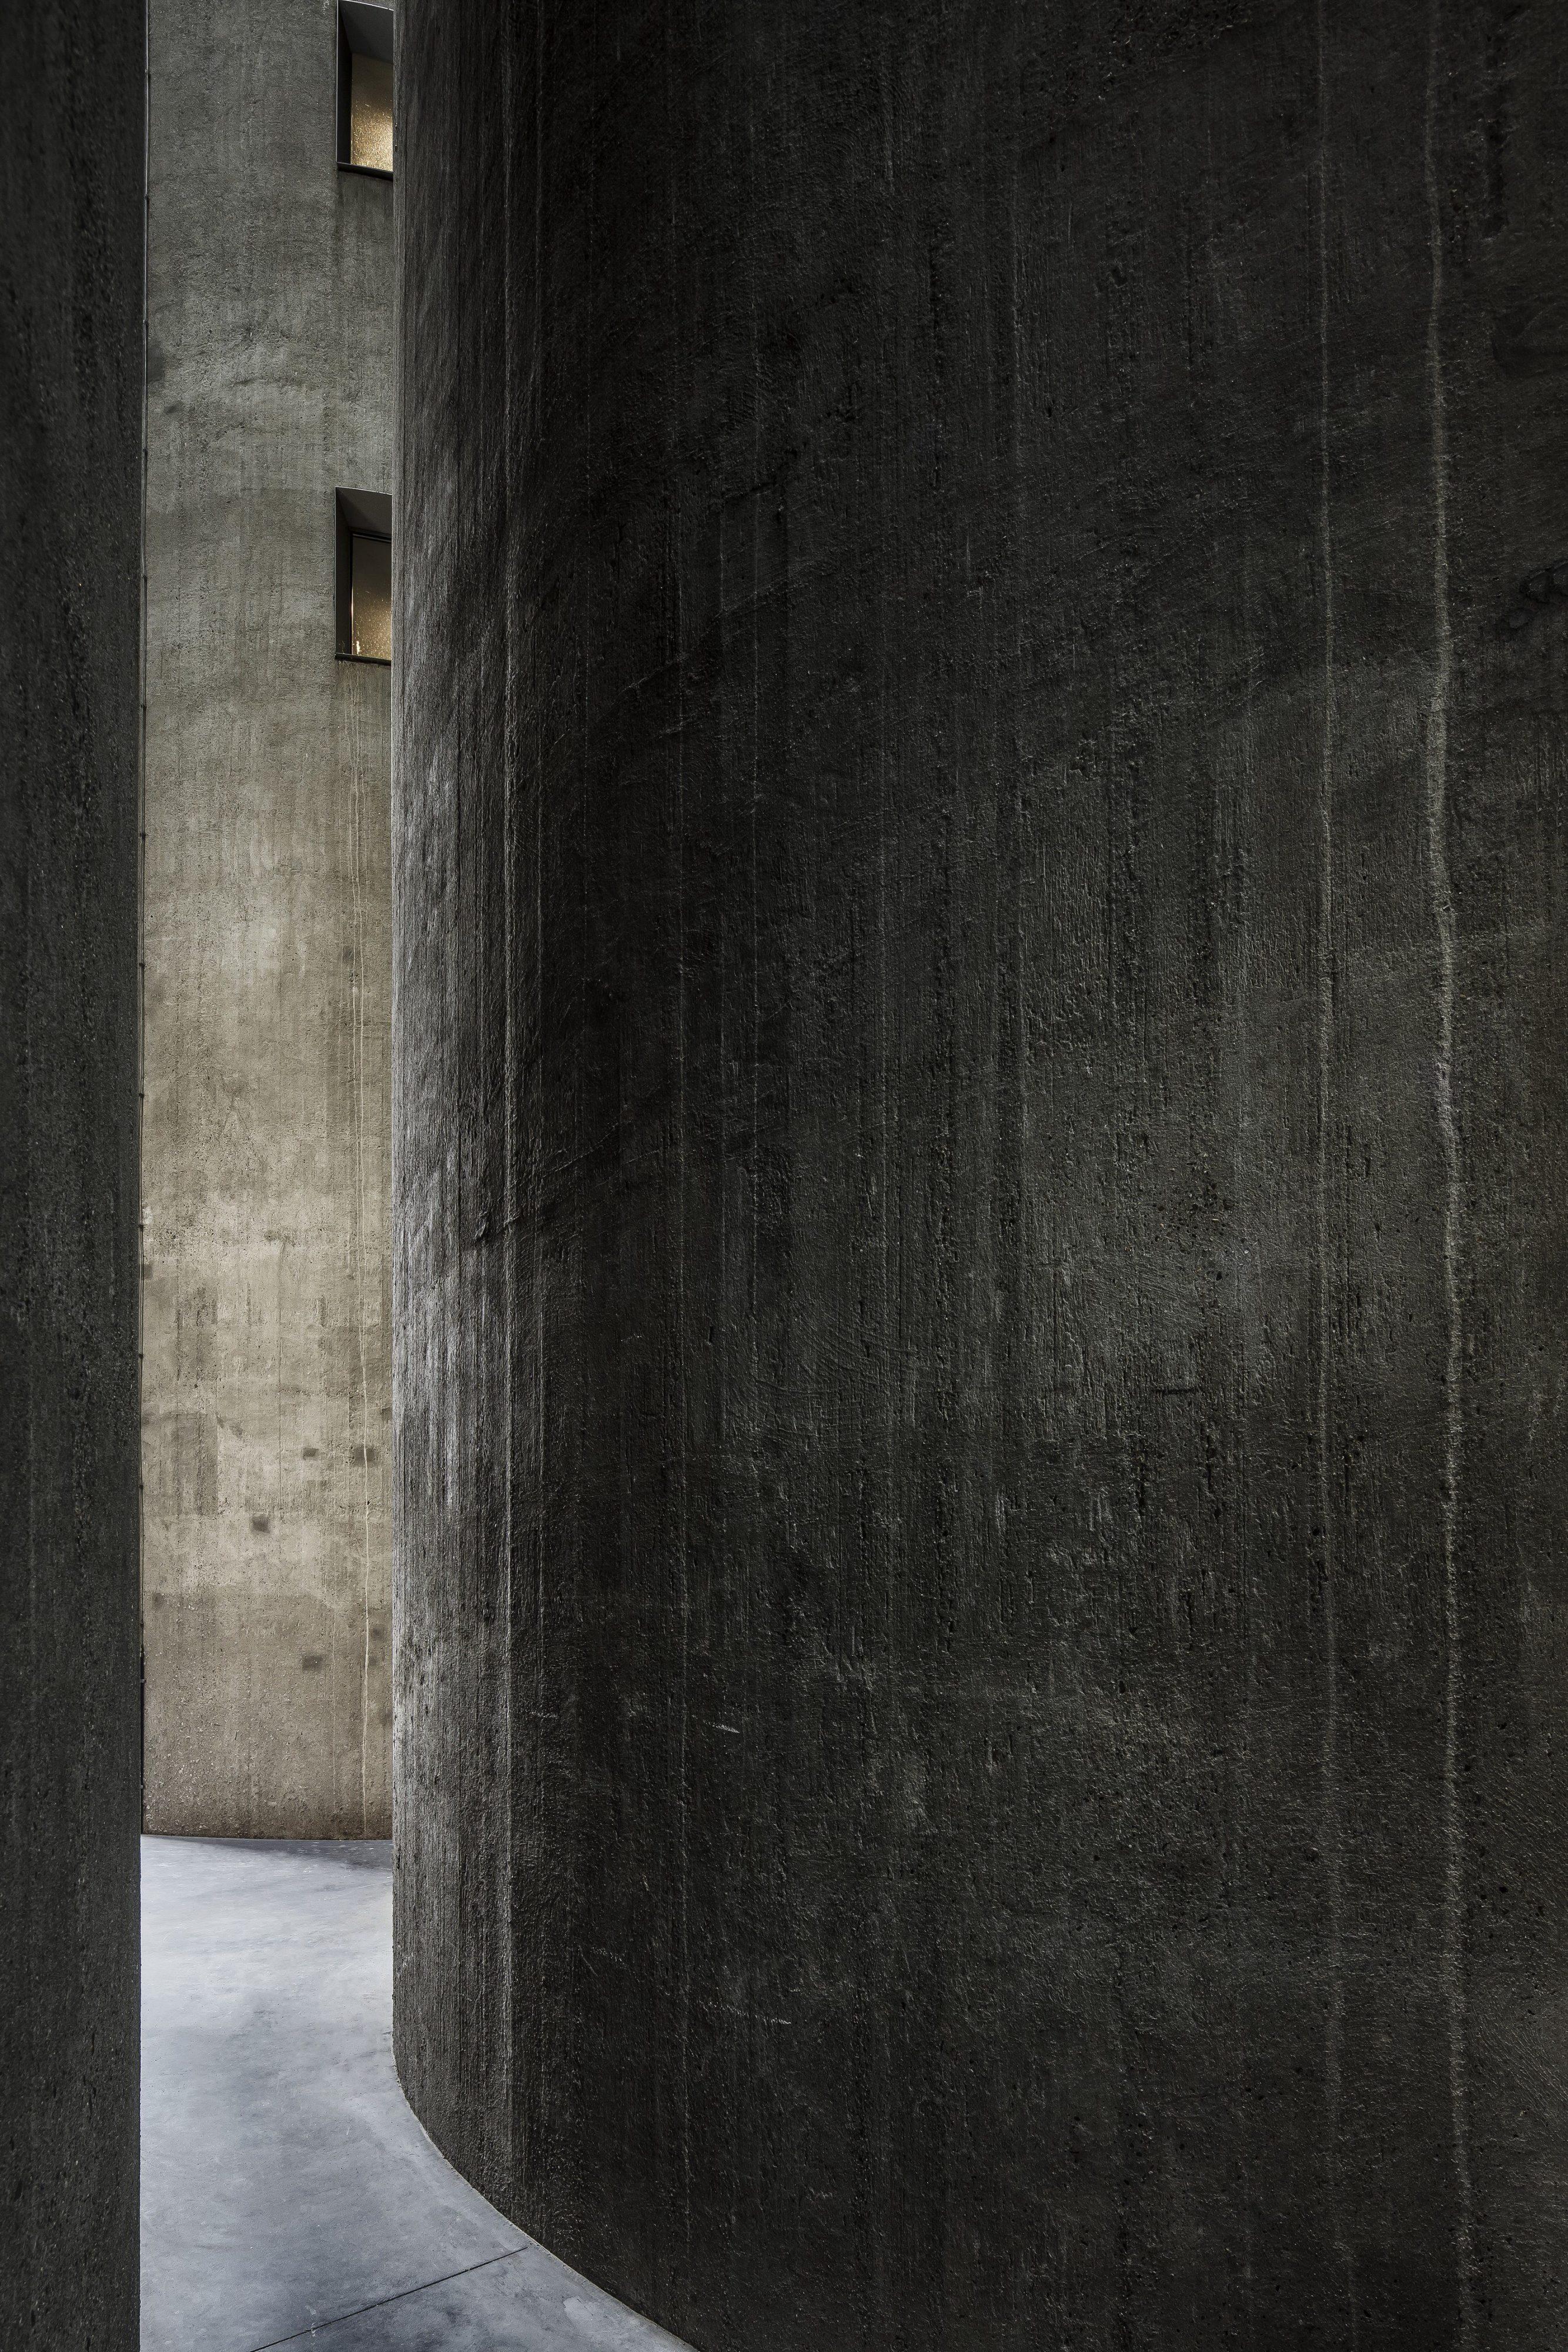 Silo Apartment M-M | Monochrome Apartment by Arjaan De Feyter